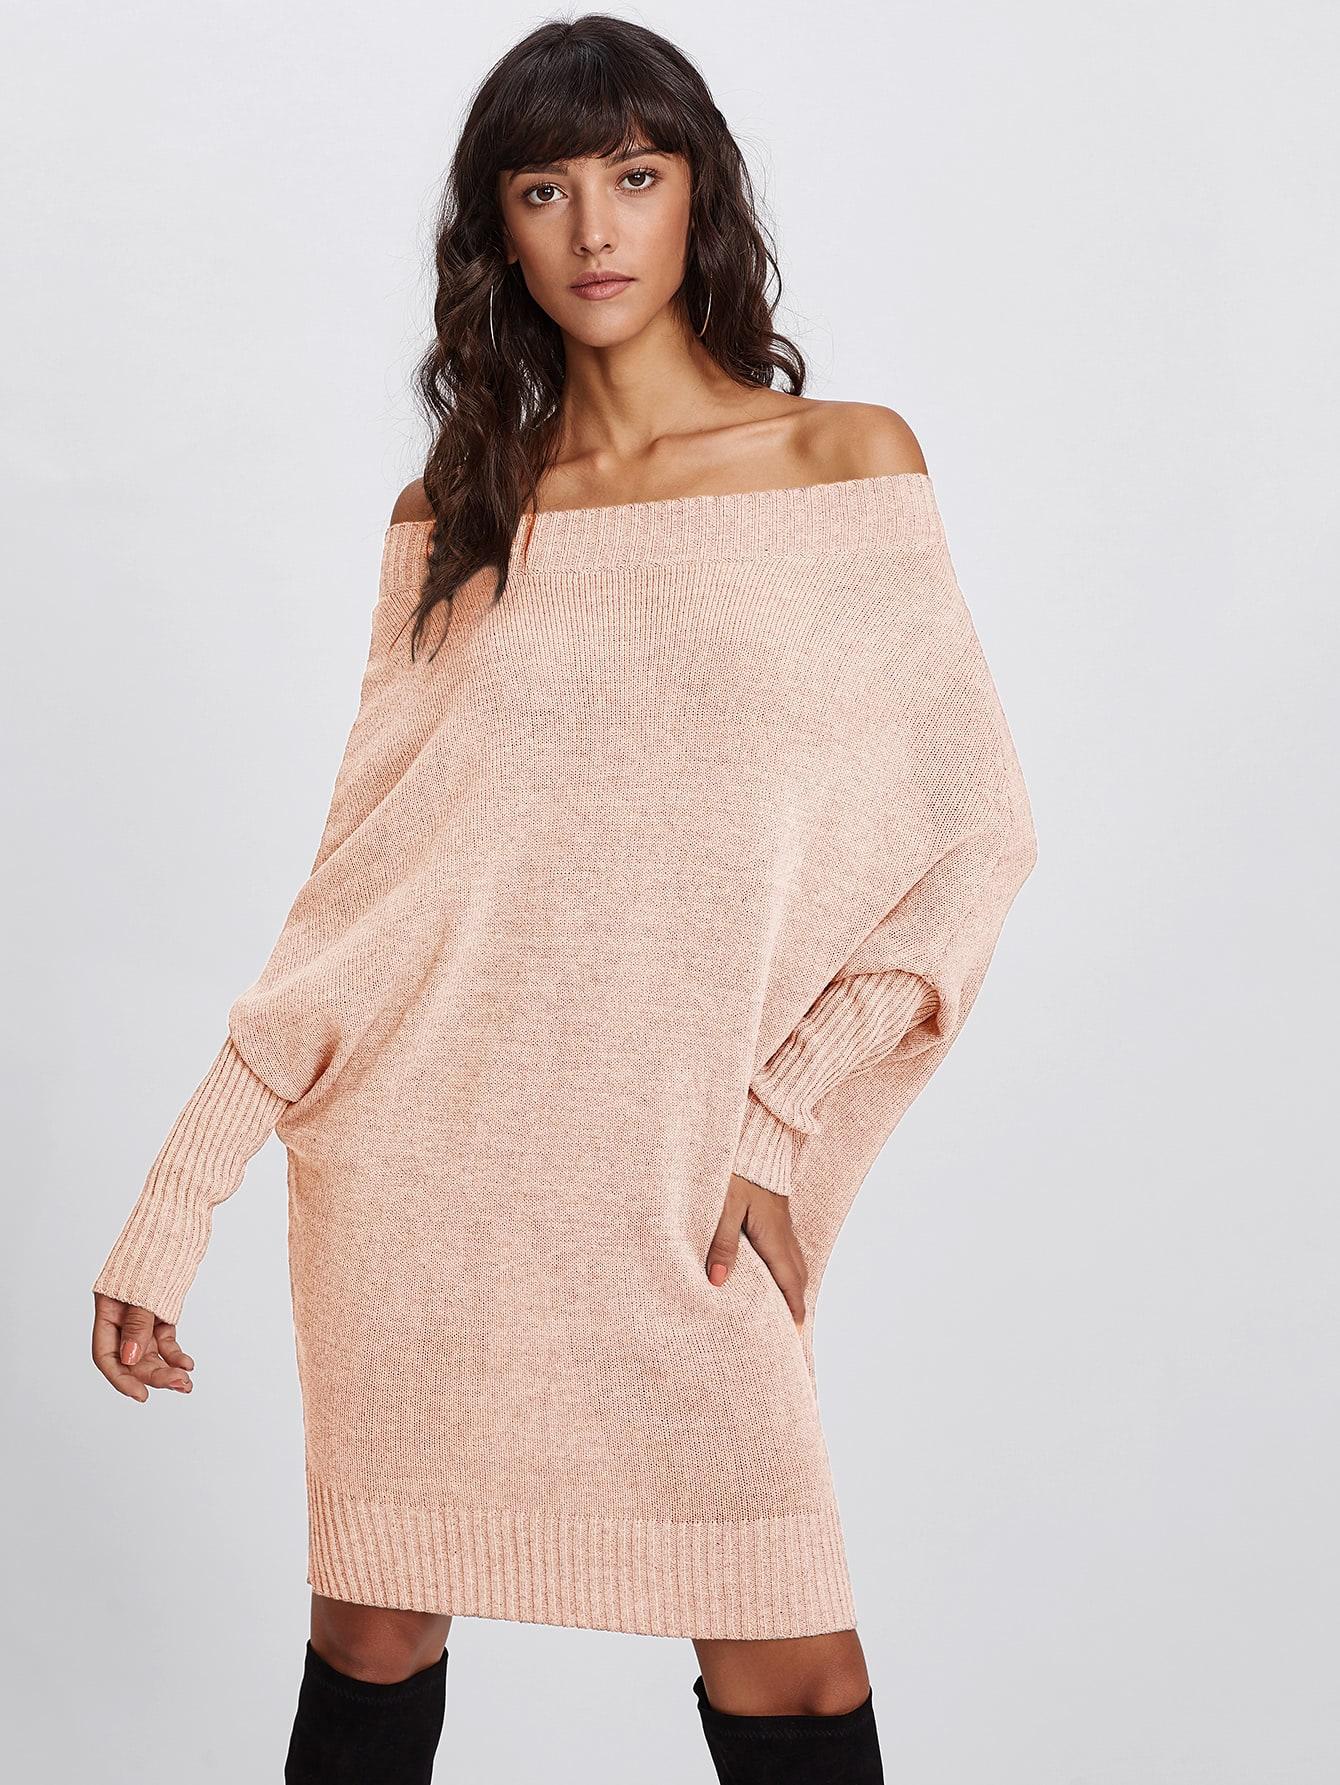 все цены на Off Shoulder Batwing Sleeve Sweater Dress